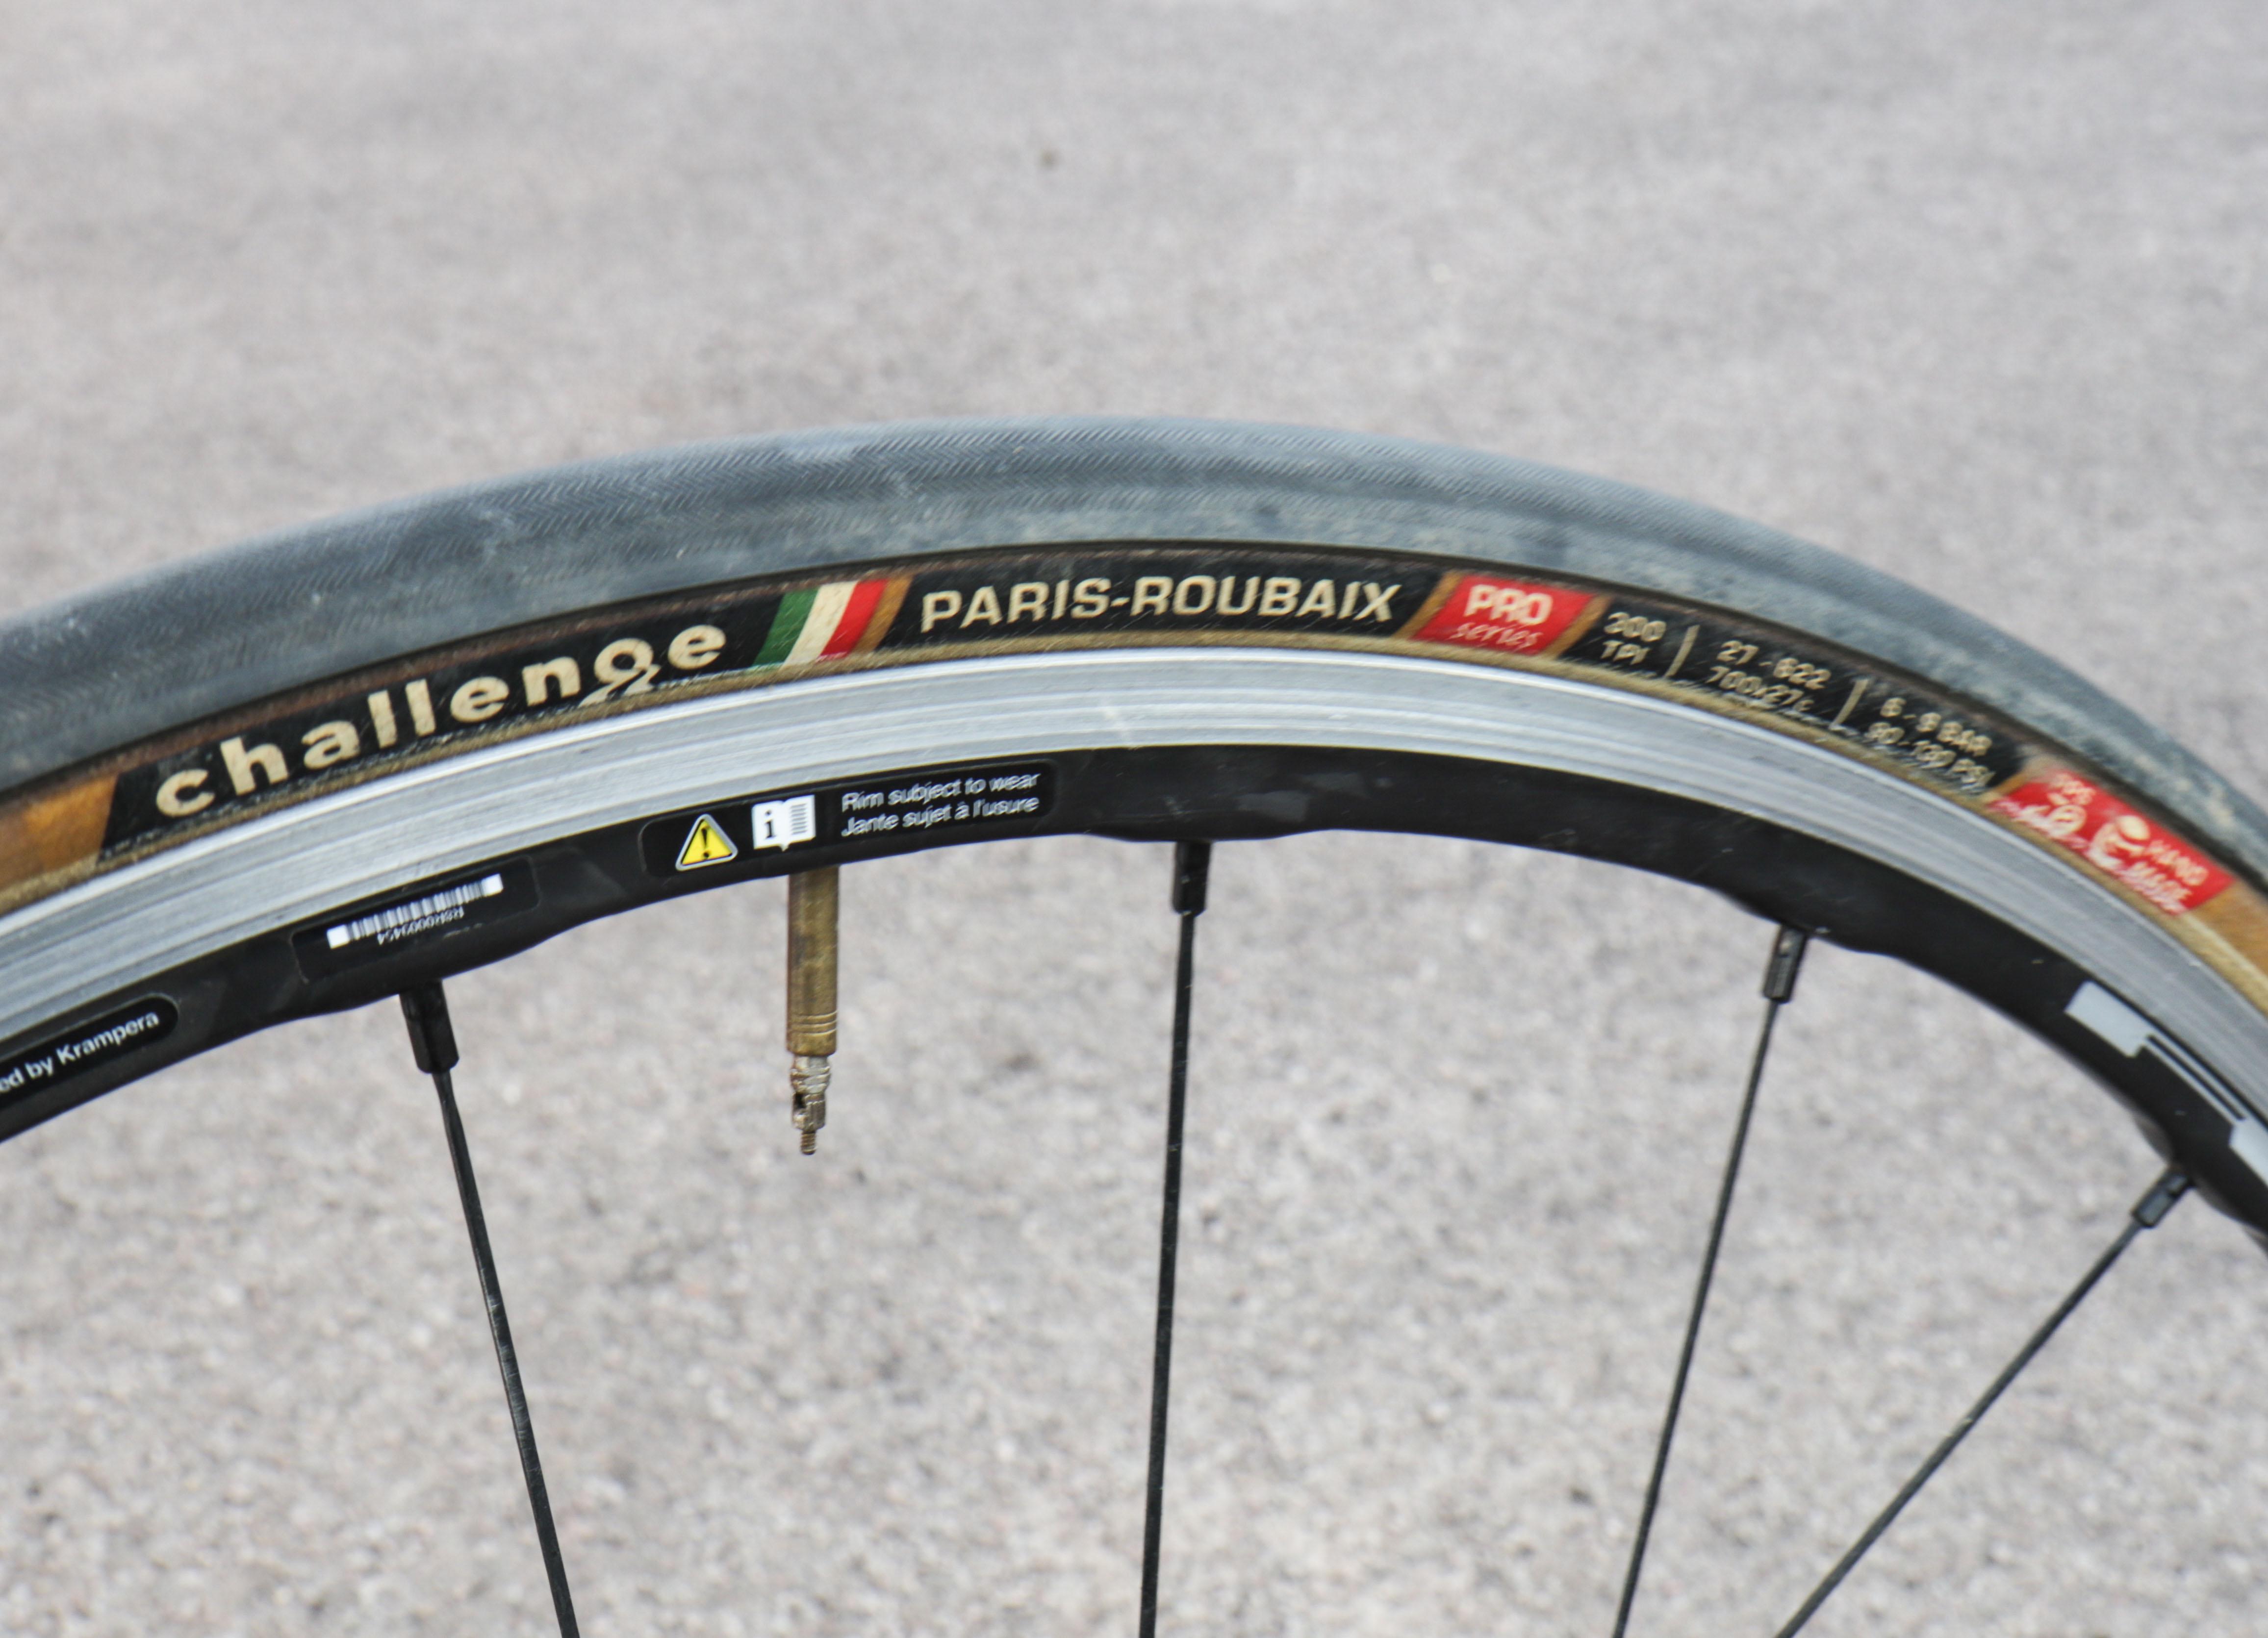 Folding Challenge Paris Roubaix Pro Tire 700 x 27 Black//Tan Tubeless